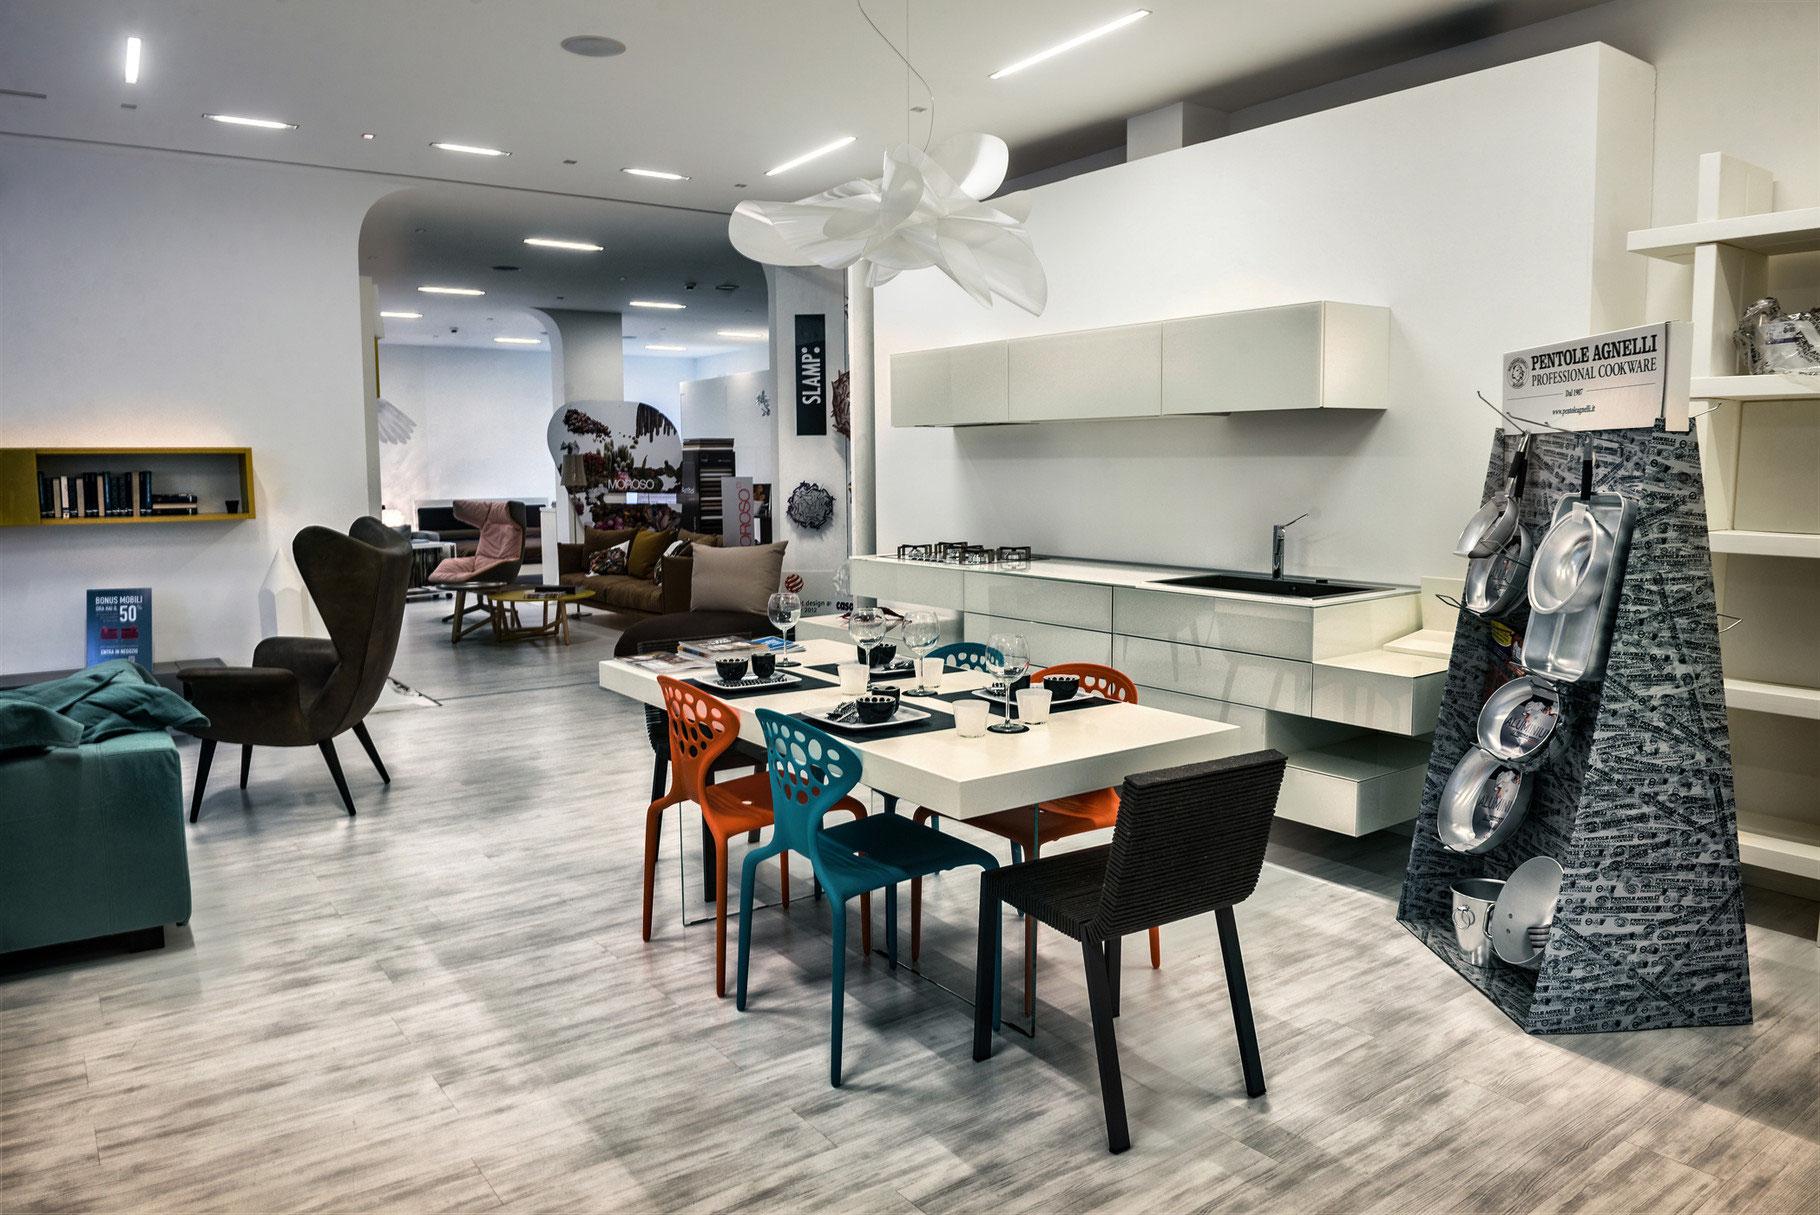 Arredamenti e mobili di design da interni s a s for Arredamento casa design interni